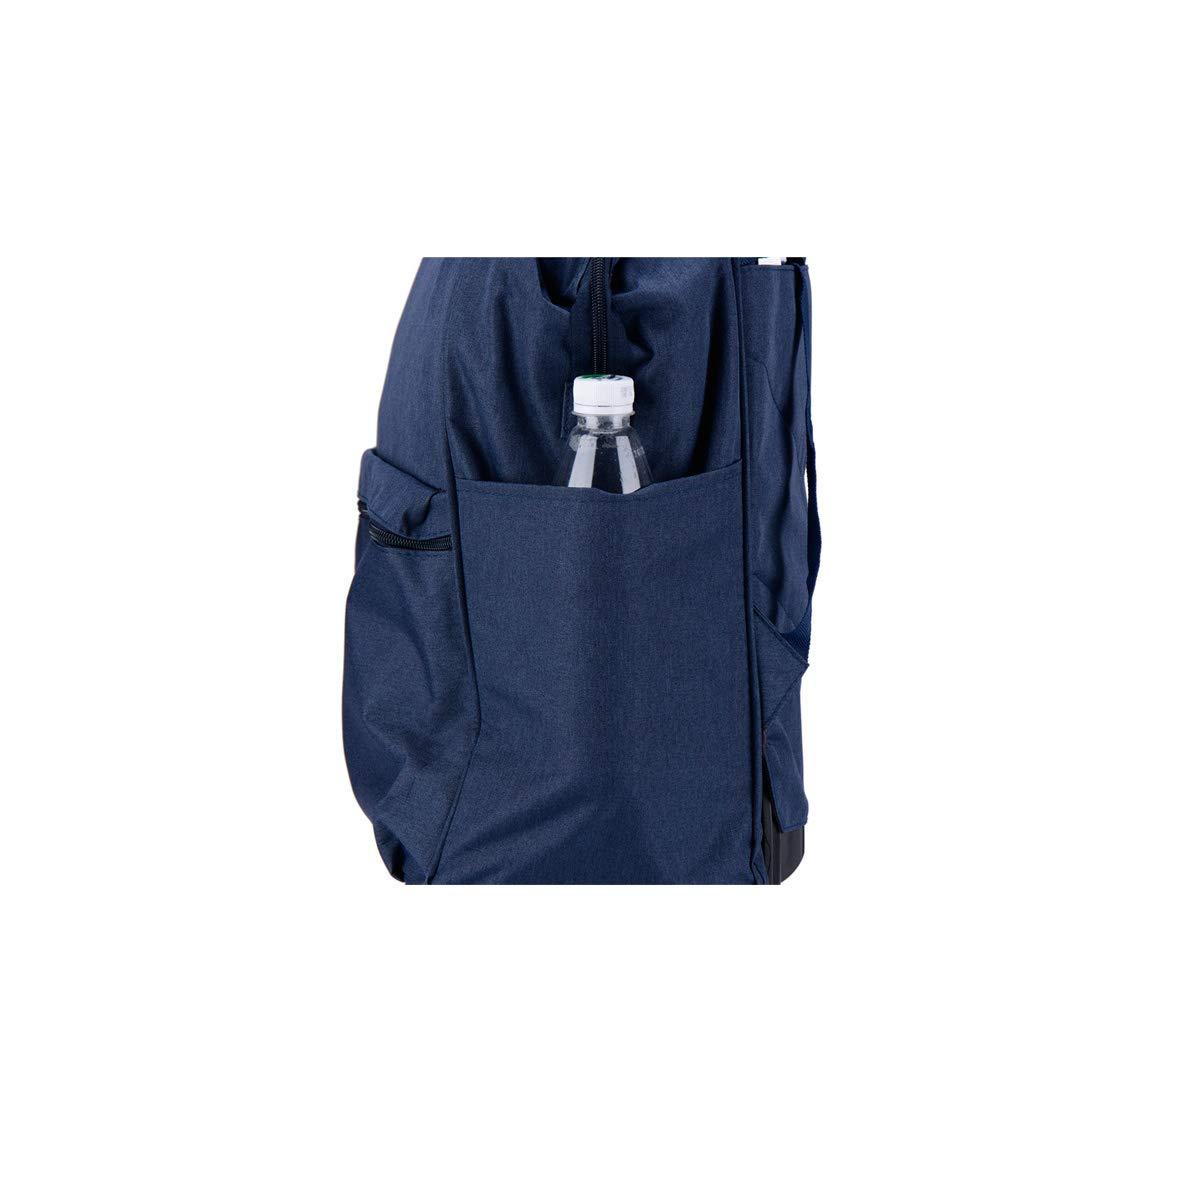 Color : Blue Handbag Soft Bag Travel Organizer Carrying Bag Blue Bahaowenjuguan Trolley case Suitcase